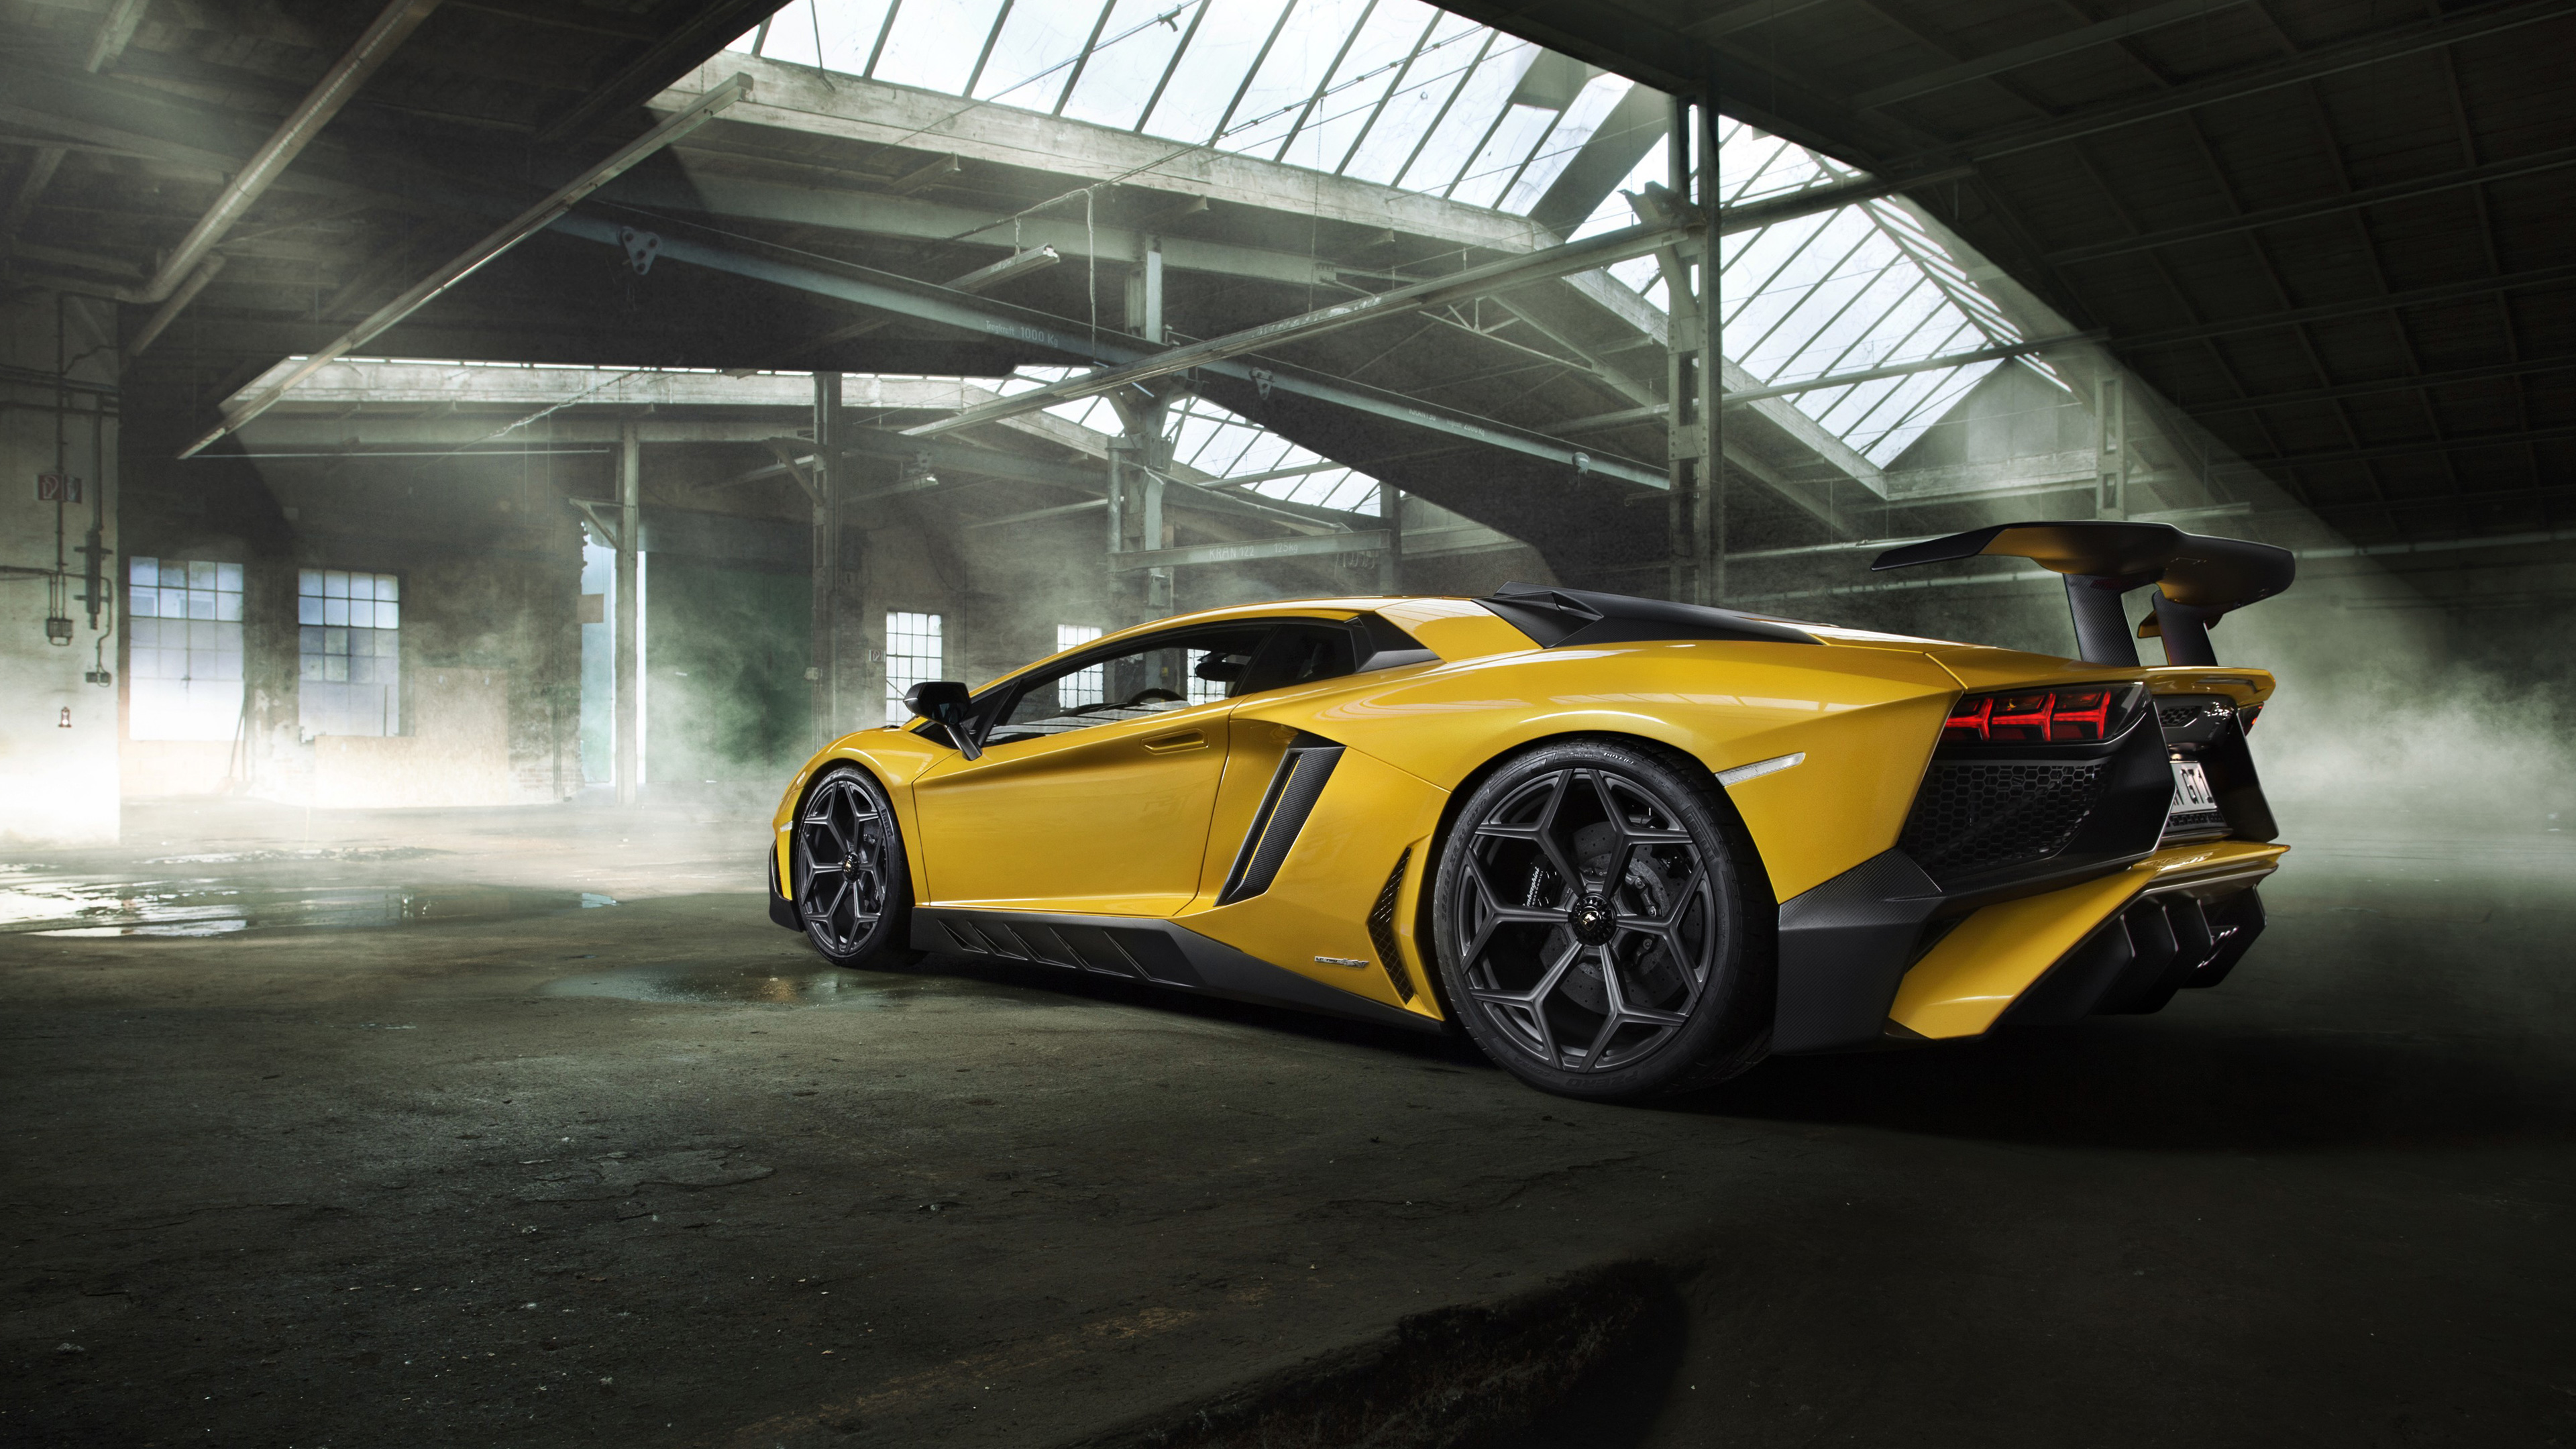 Lamborghini Aventador Superlove HD, HD Cars, 4k Wallpapers ...